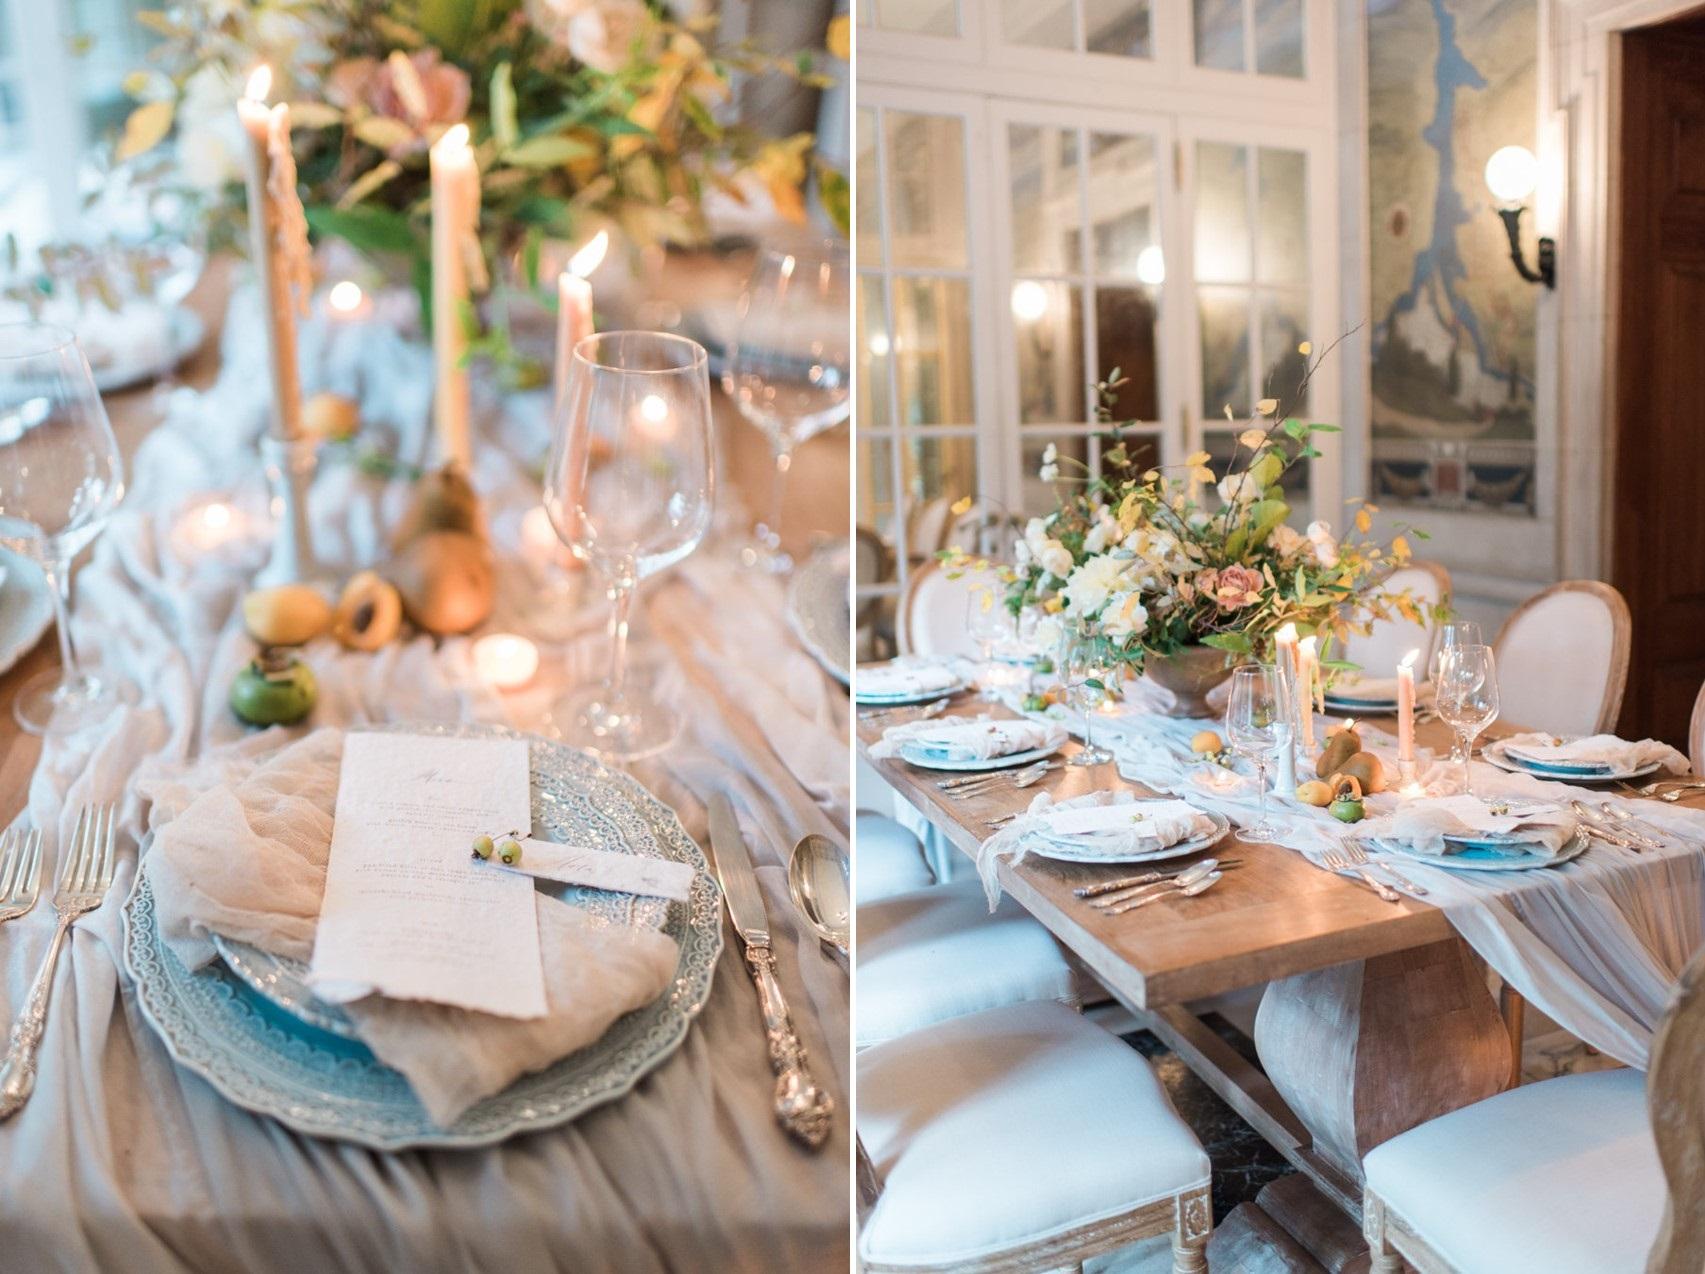 Elegant Regal Wedding Table